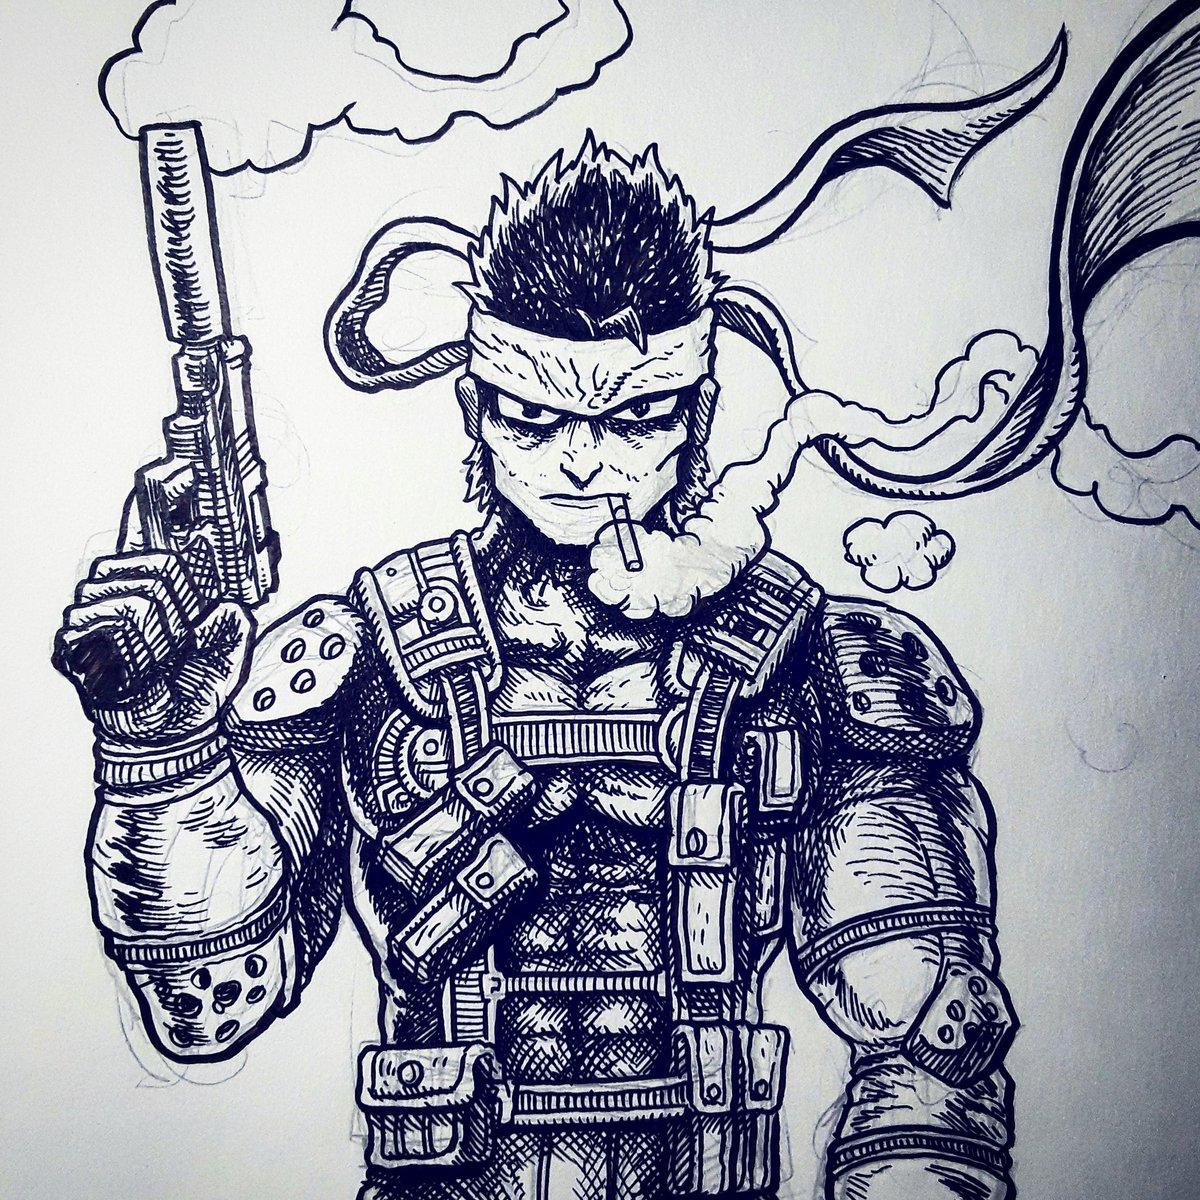 M Deeeee On Twitter Mgs1 Solid Snake Commission Wip Mgs